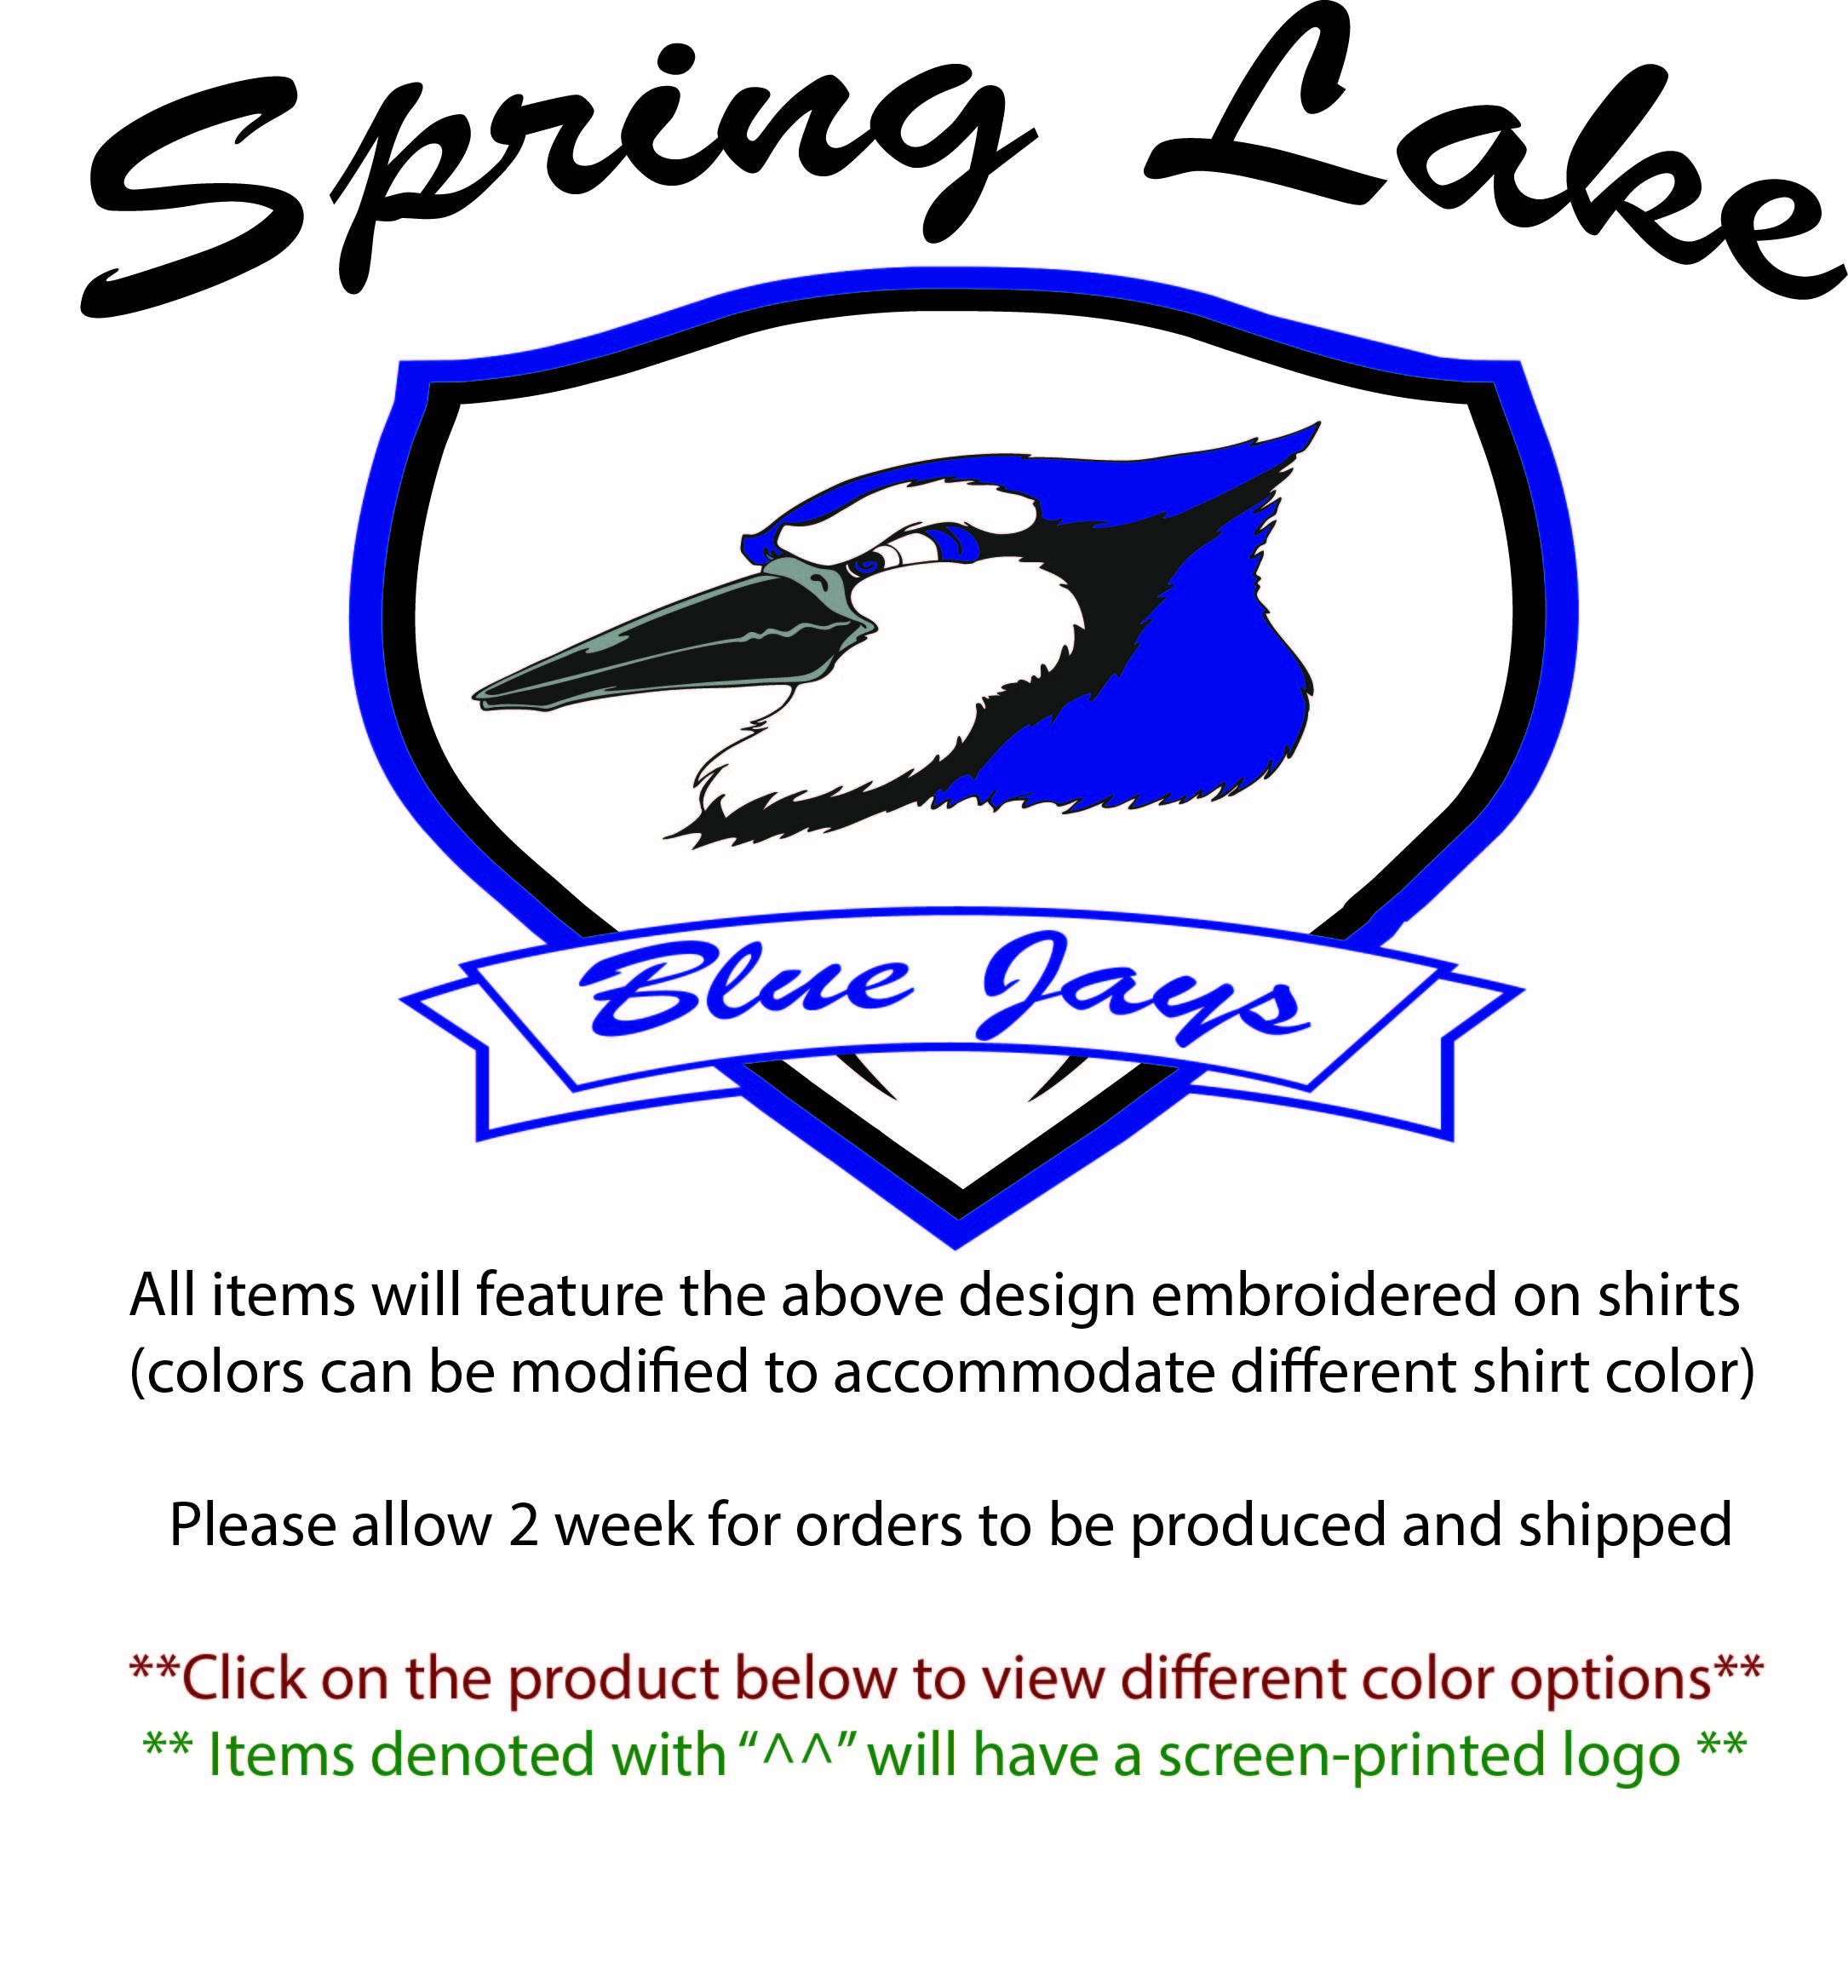 spring-lake-web-site-header-staff.jpg